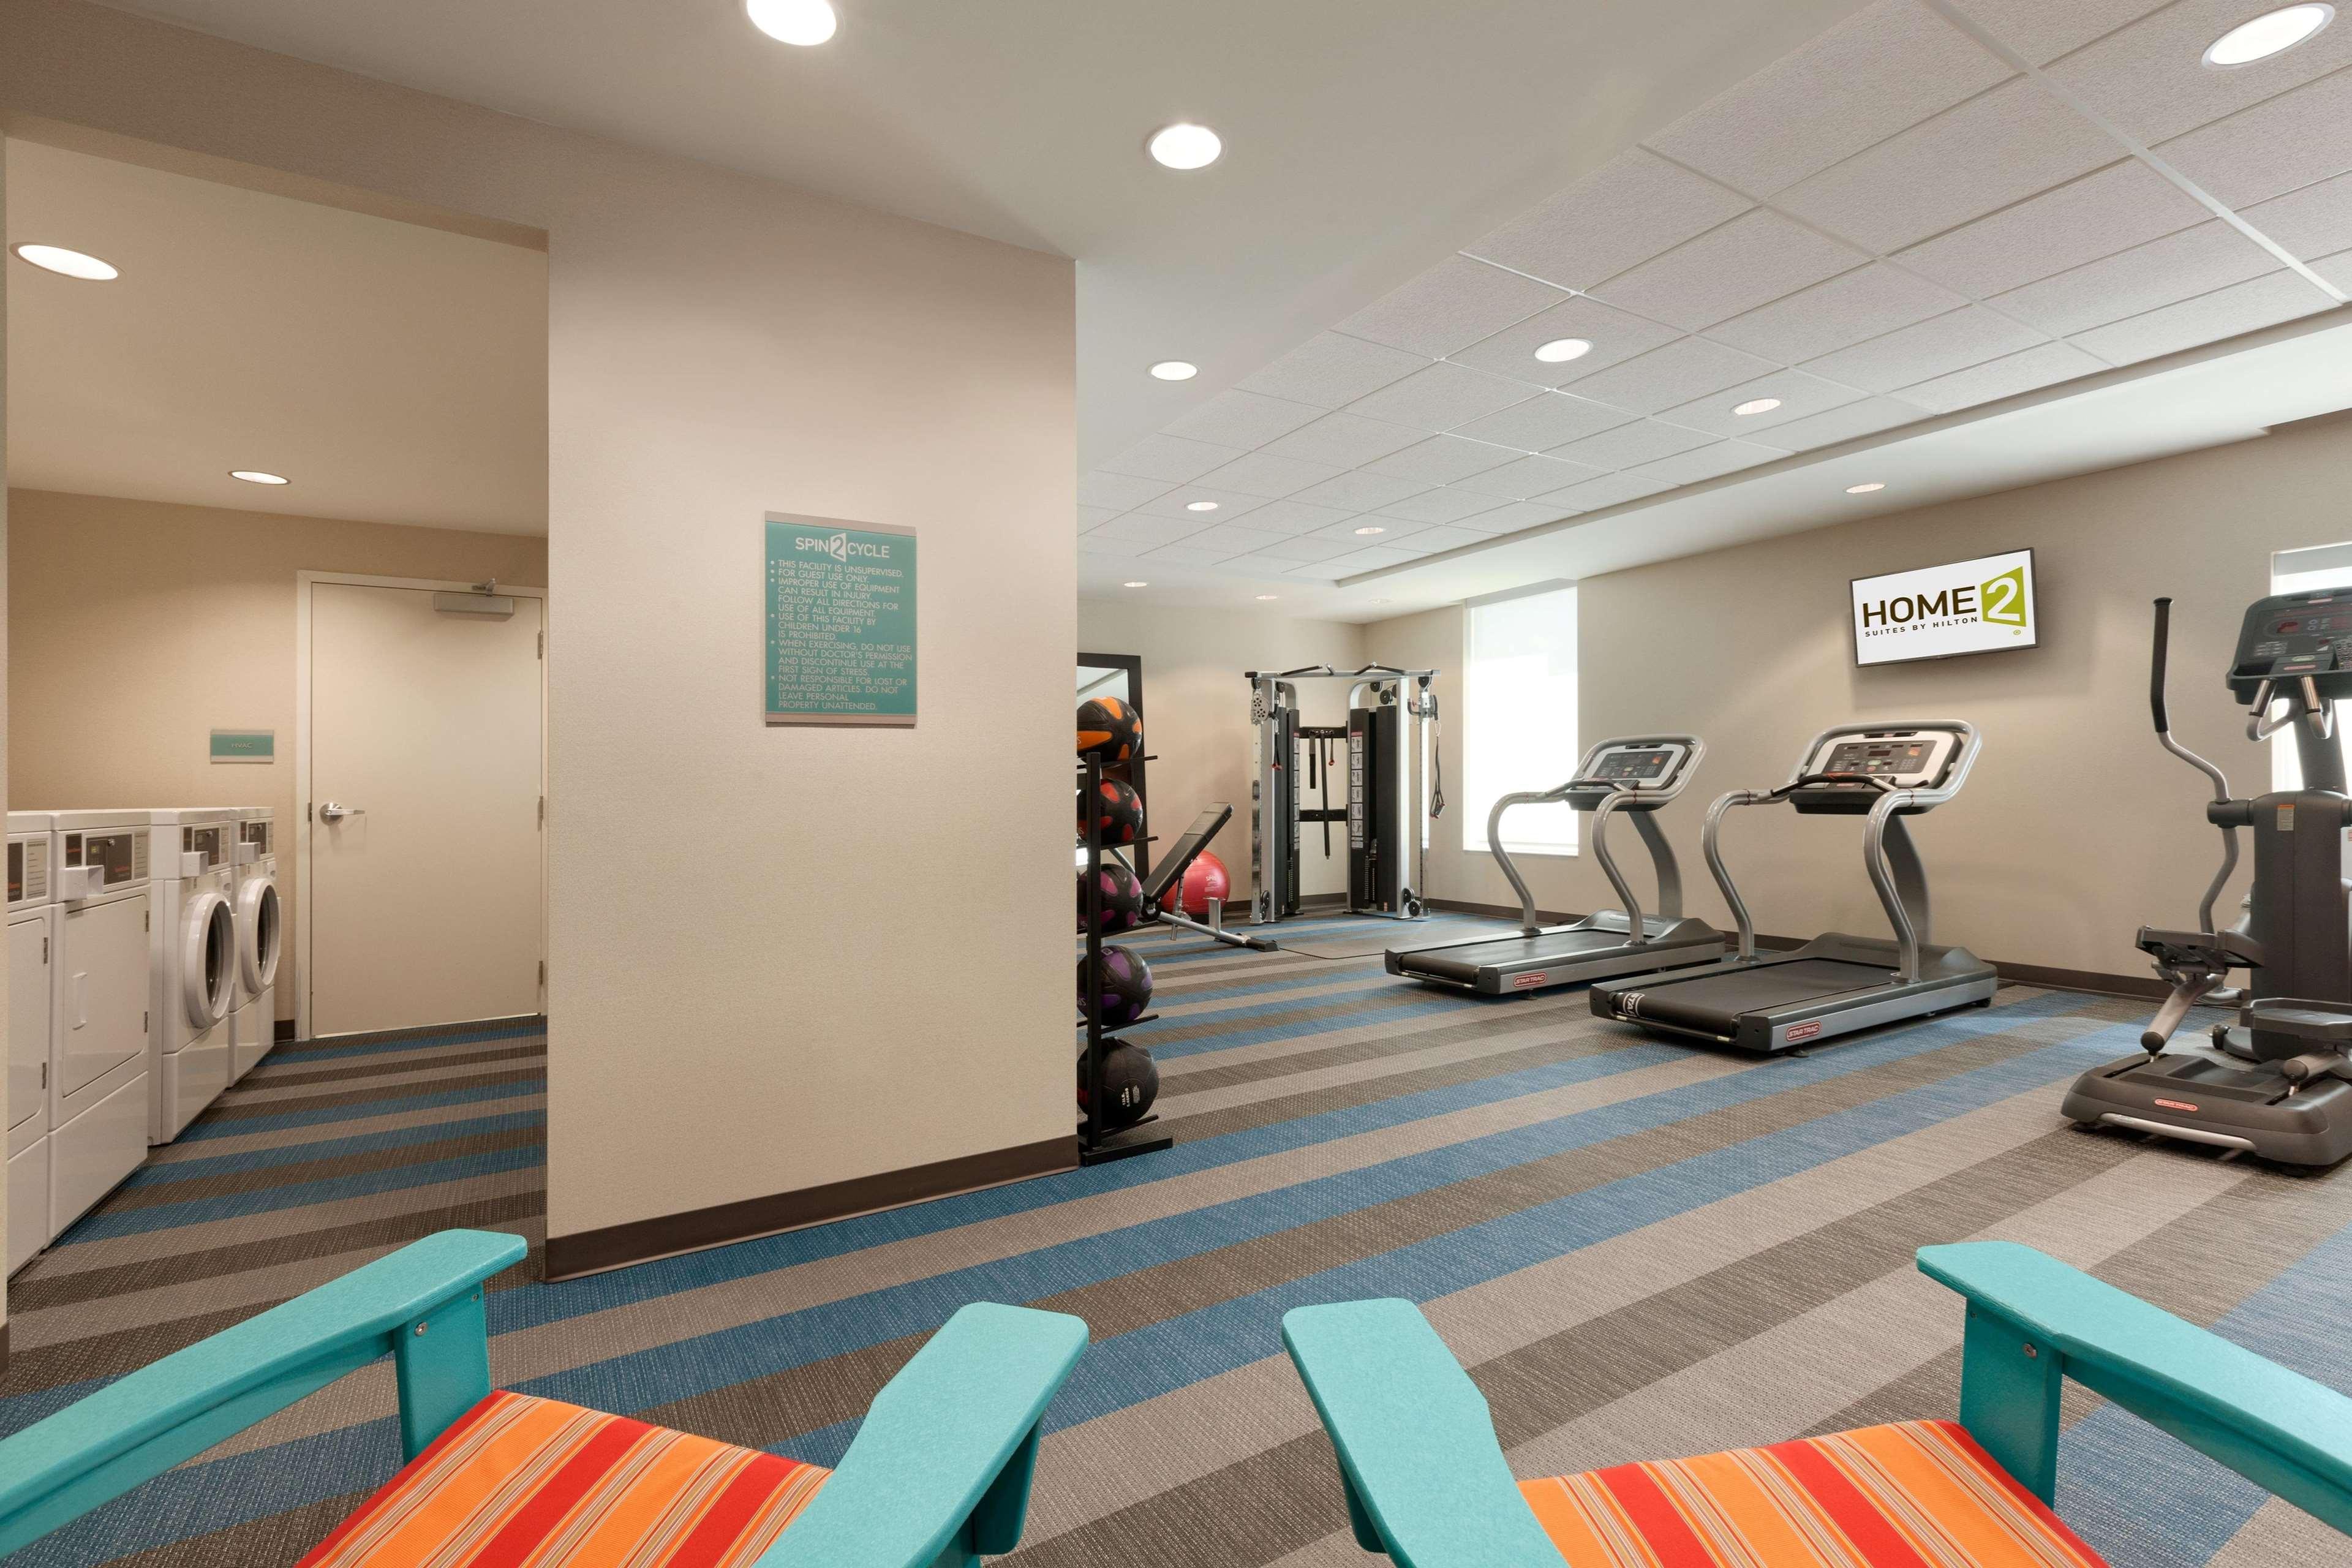 Home2 Suites By Hilton Seattle Airport  Tukwila Washington